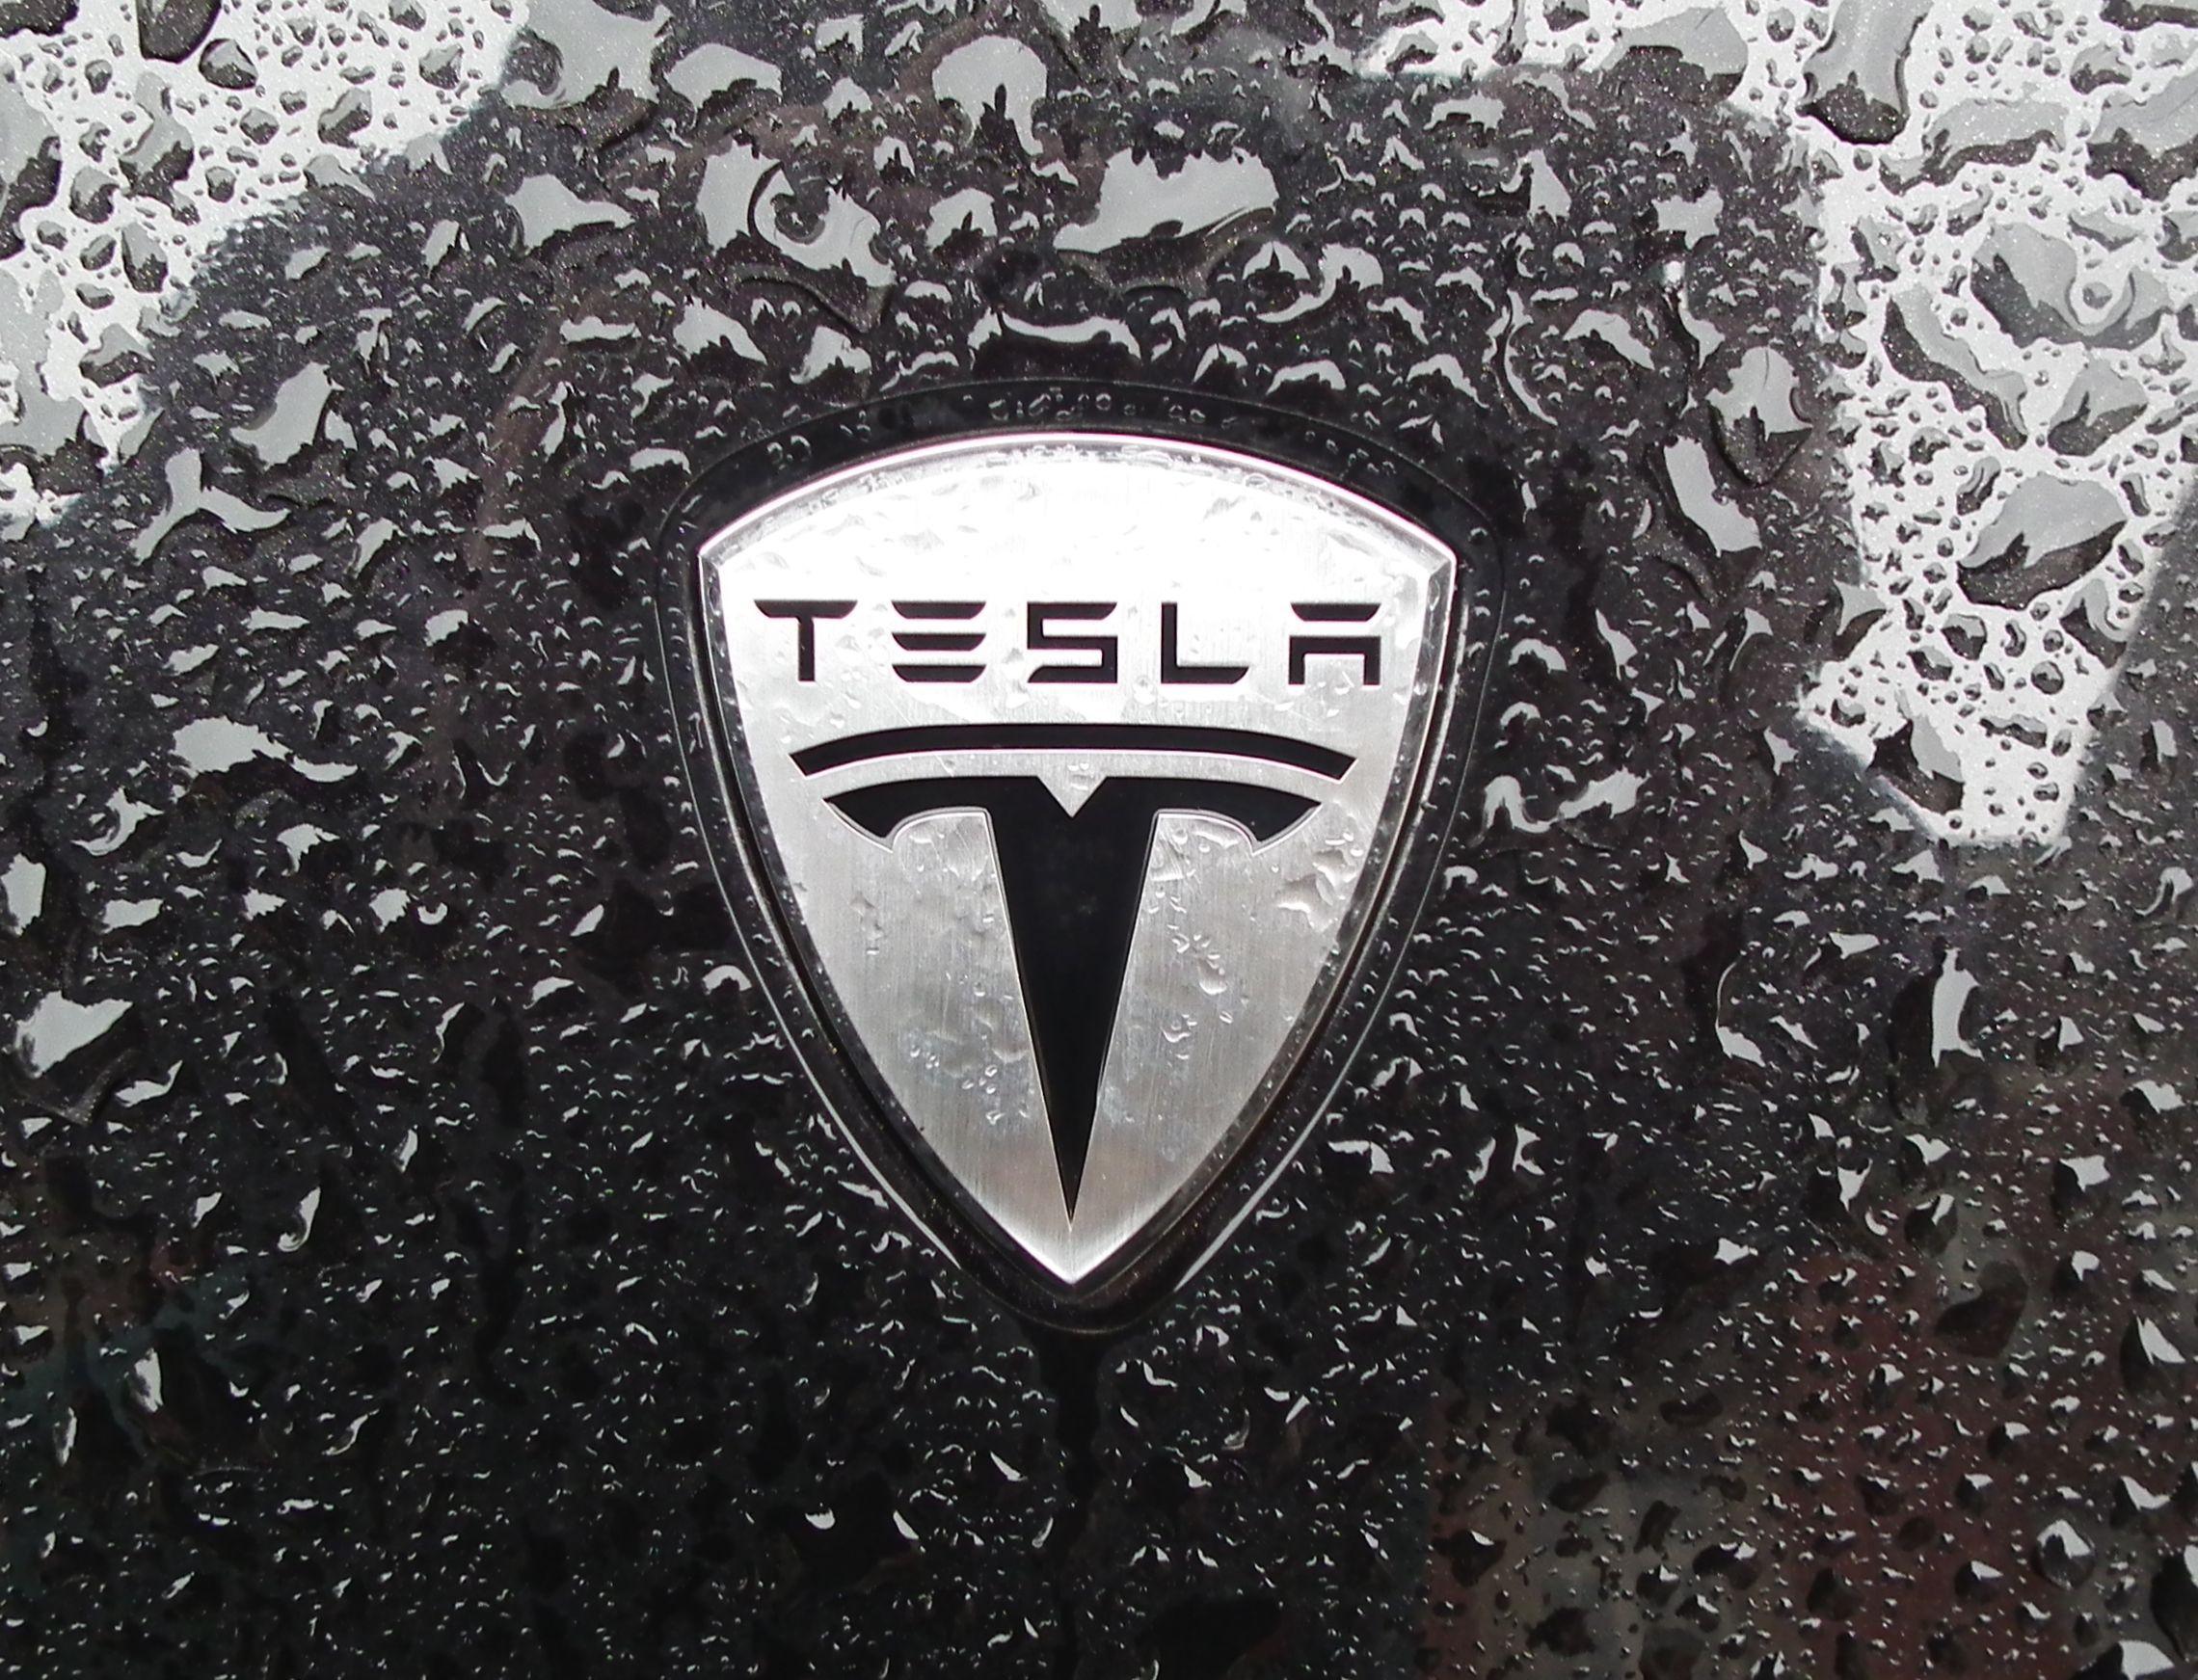 Tesla's shares go on Algorand